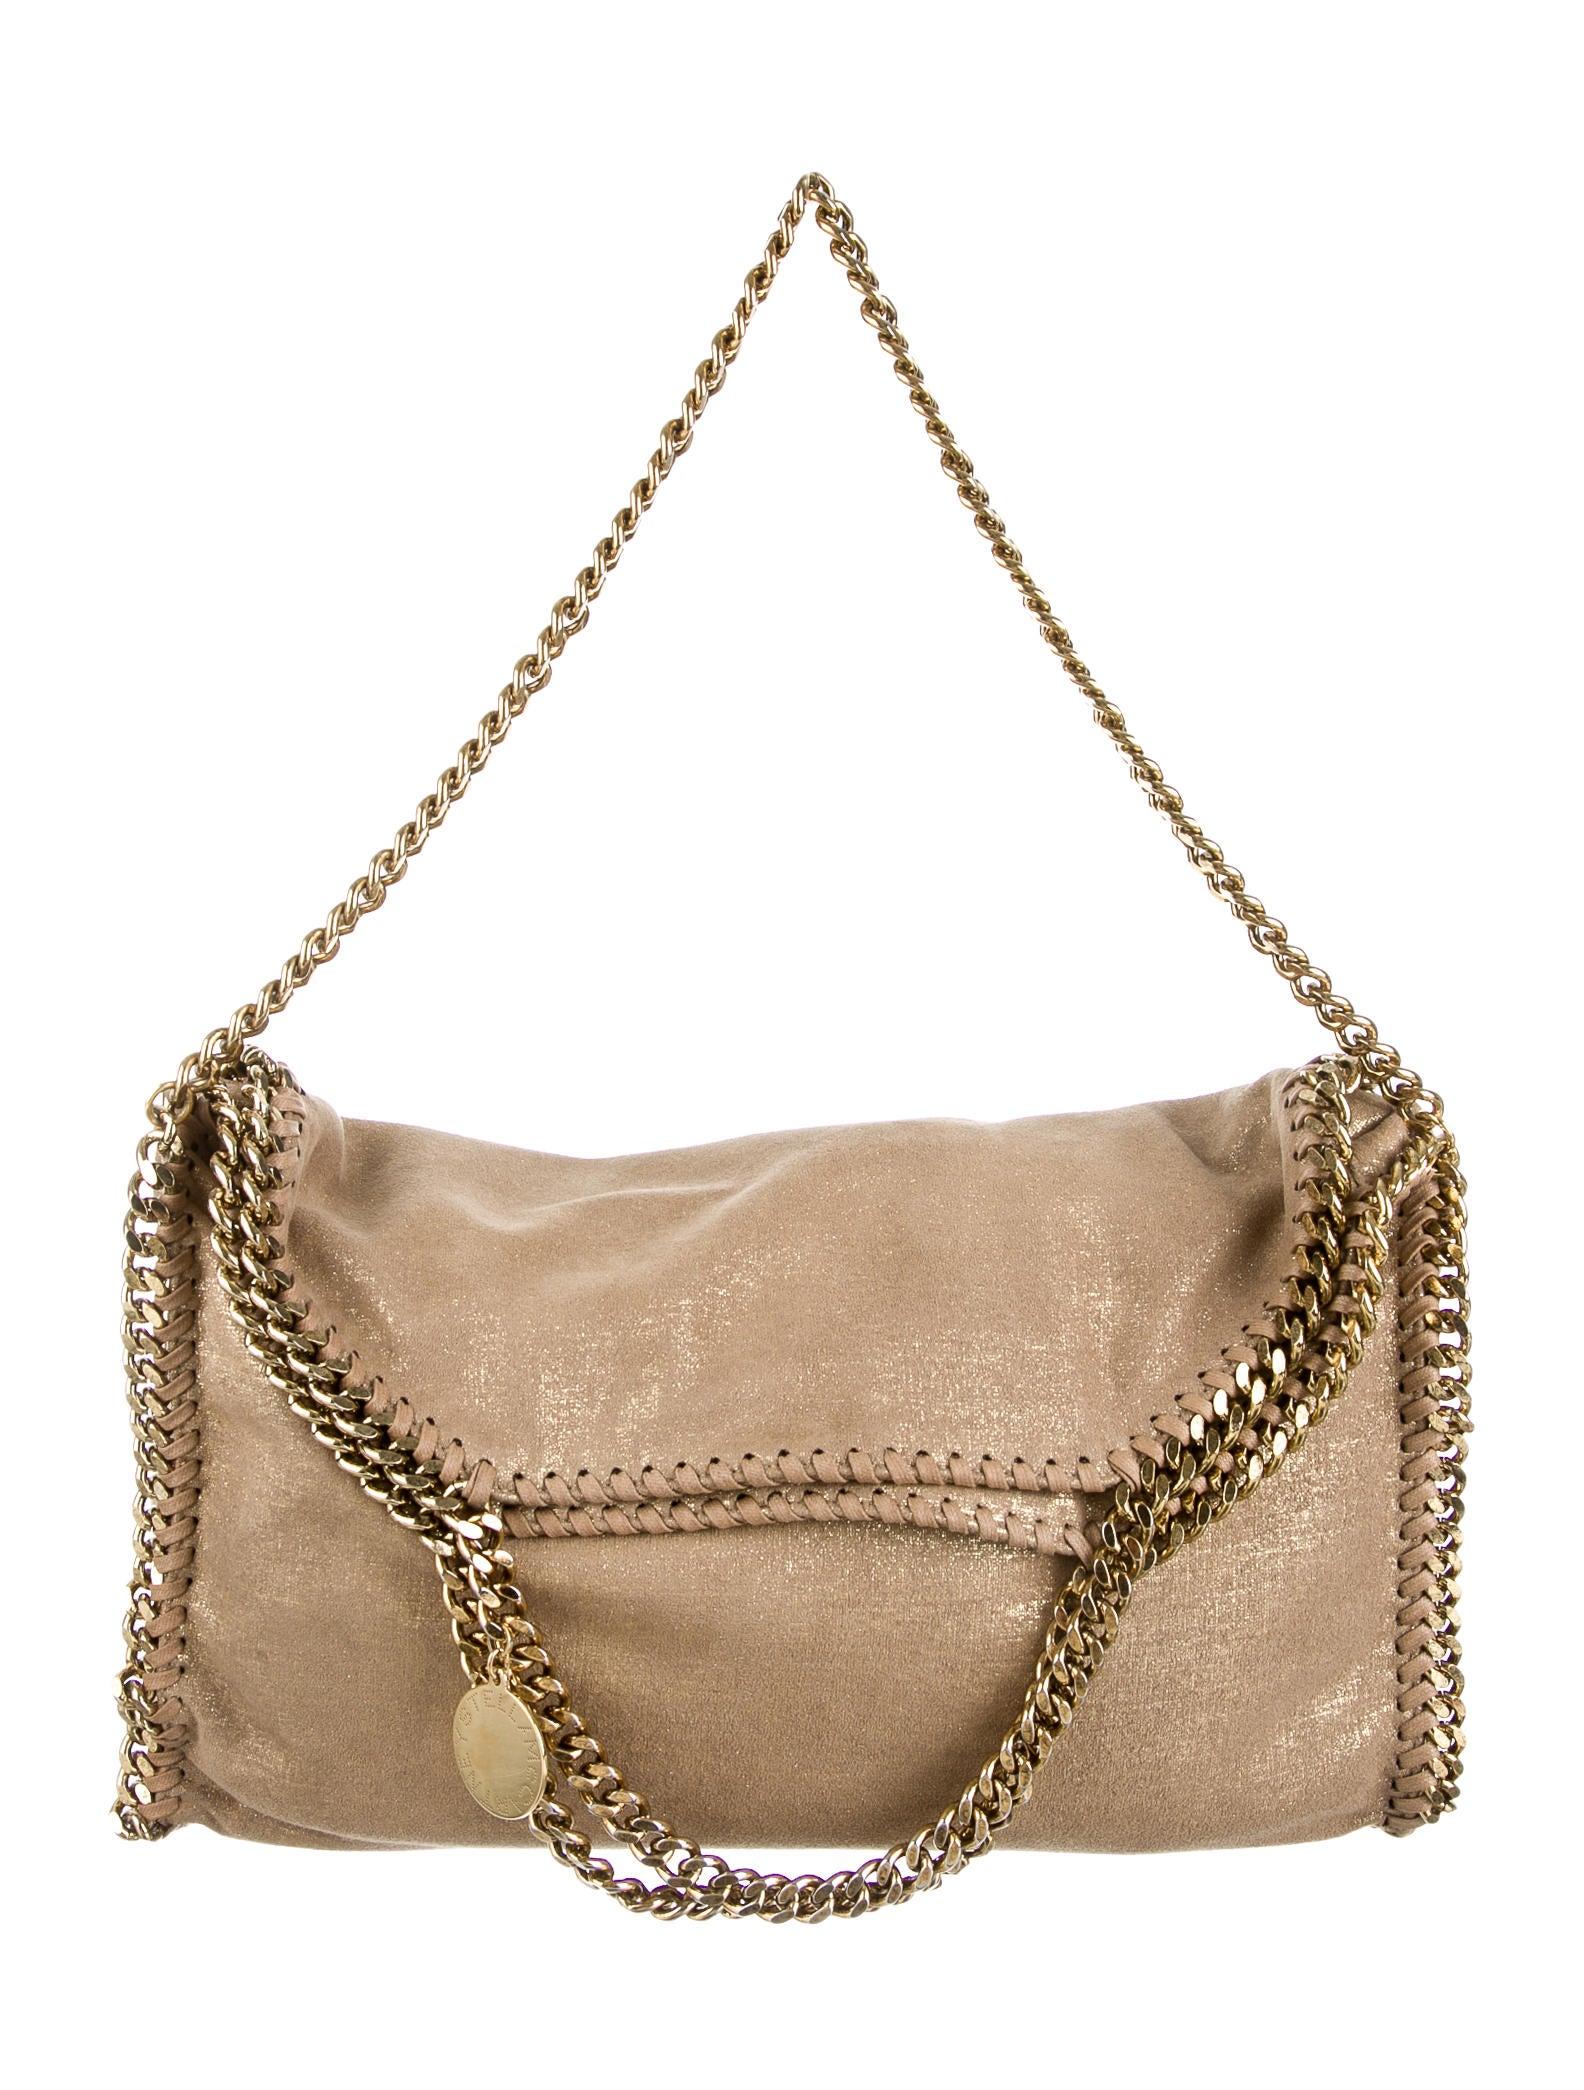 stella mccartney falabella bag handbags stl31148 the realreal. Black Bedroom Furniture Sets. Home Design Ideas